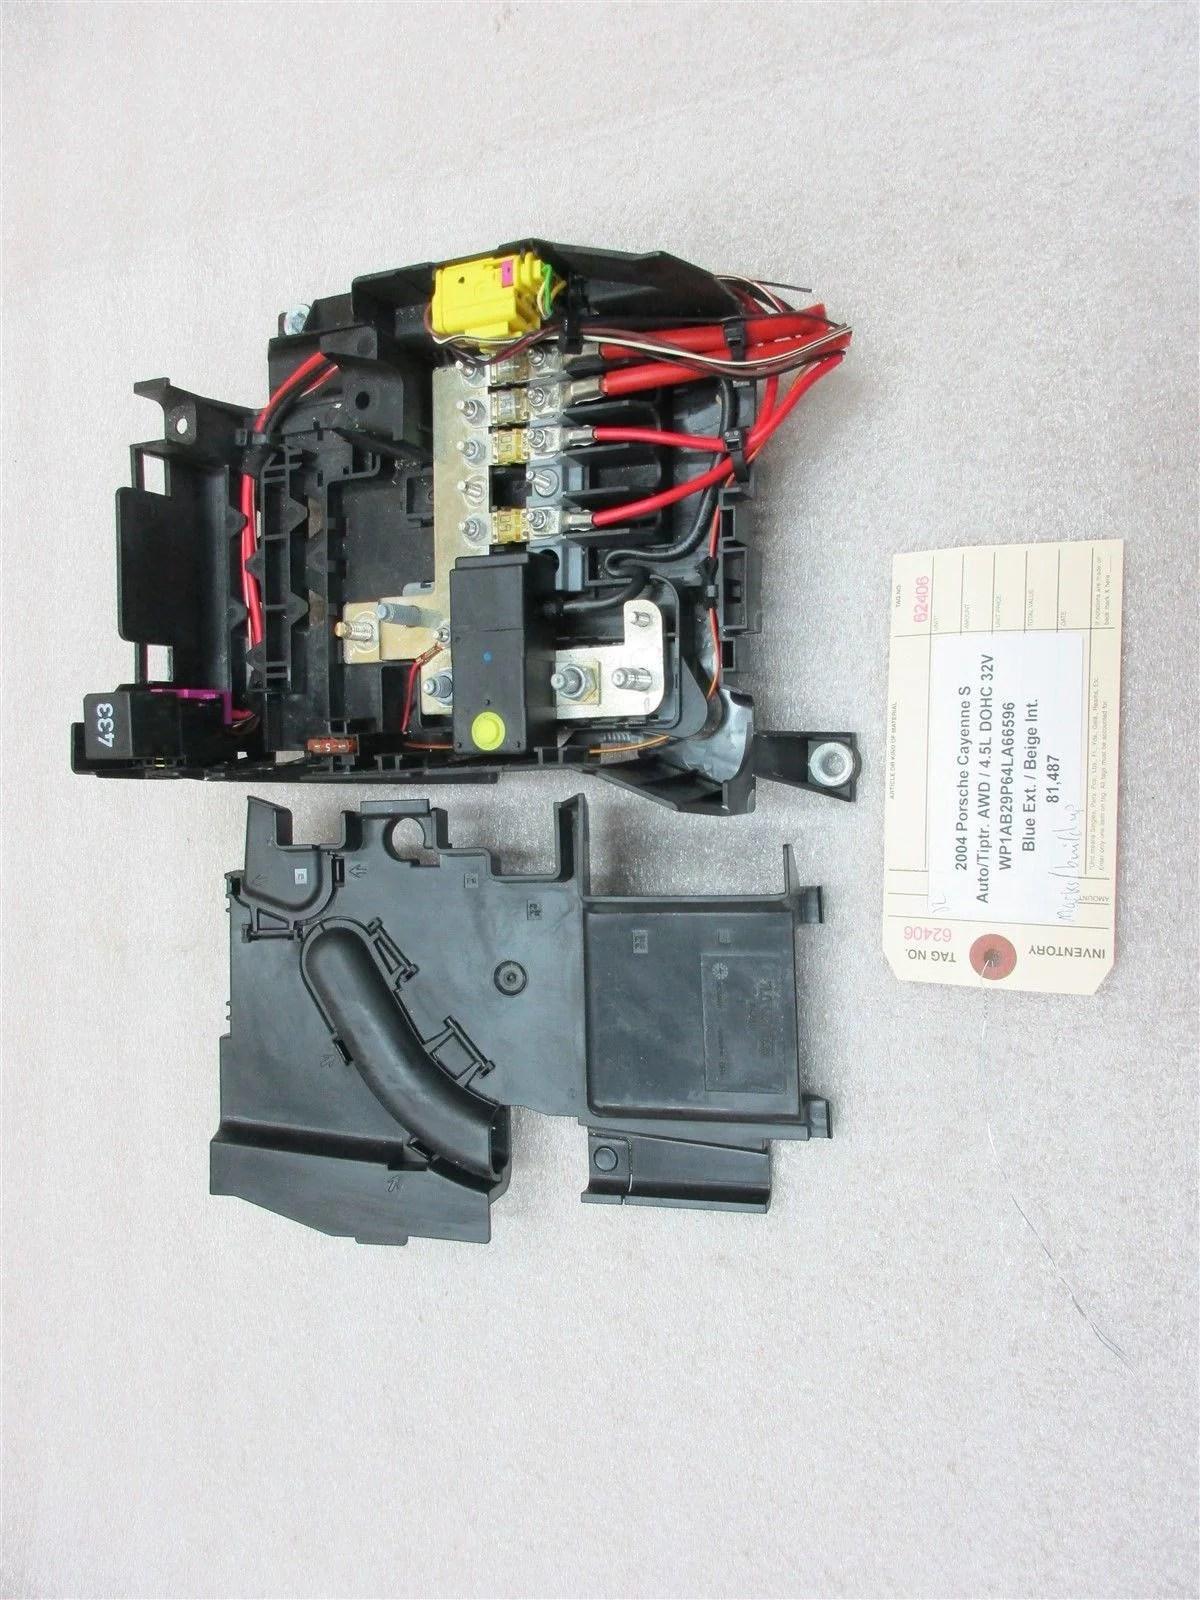 small resolution of 04 cayenne s awd porsche 955 fuse box relay 7l0937548a 7l0937555 81 487